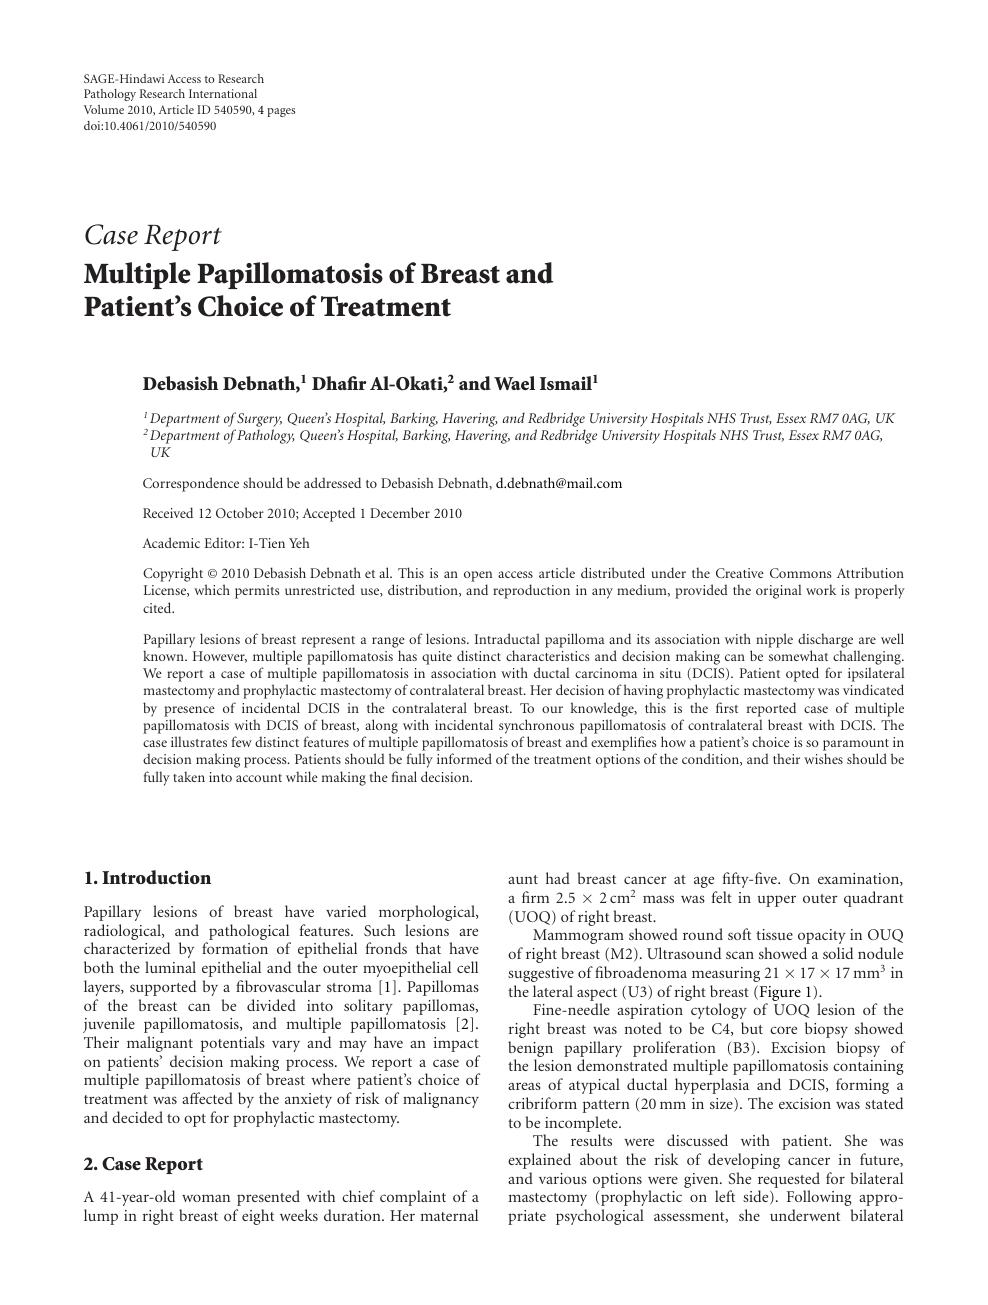 intraductal papilloma patient uk